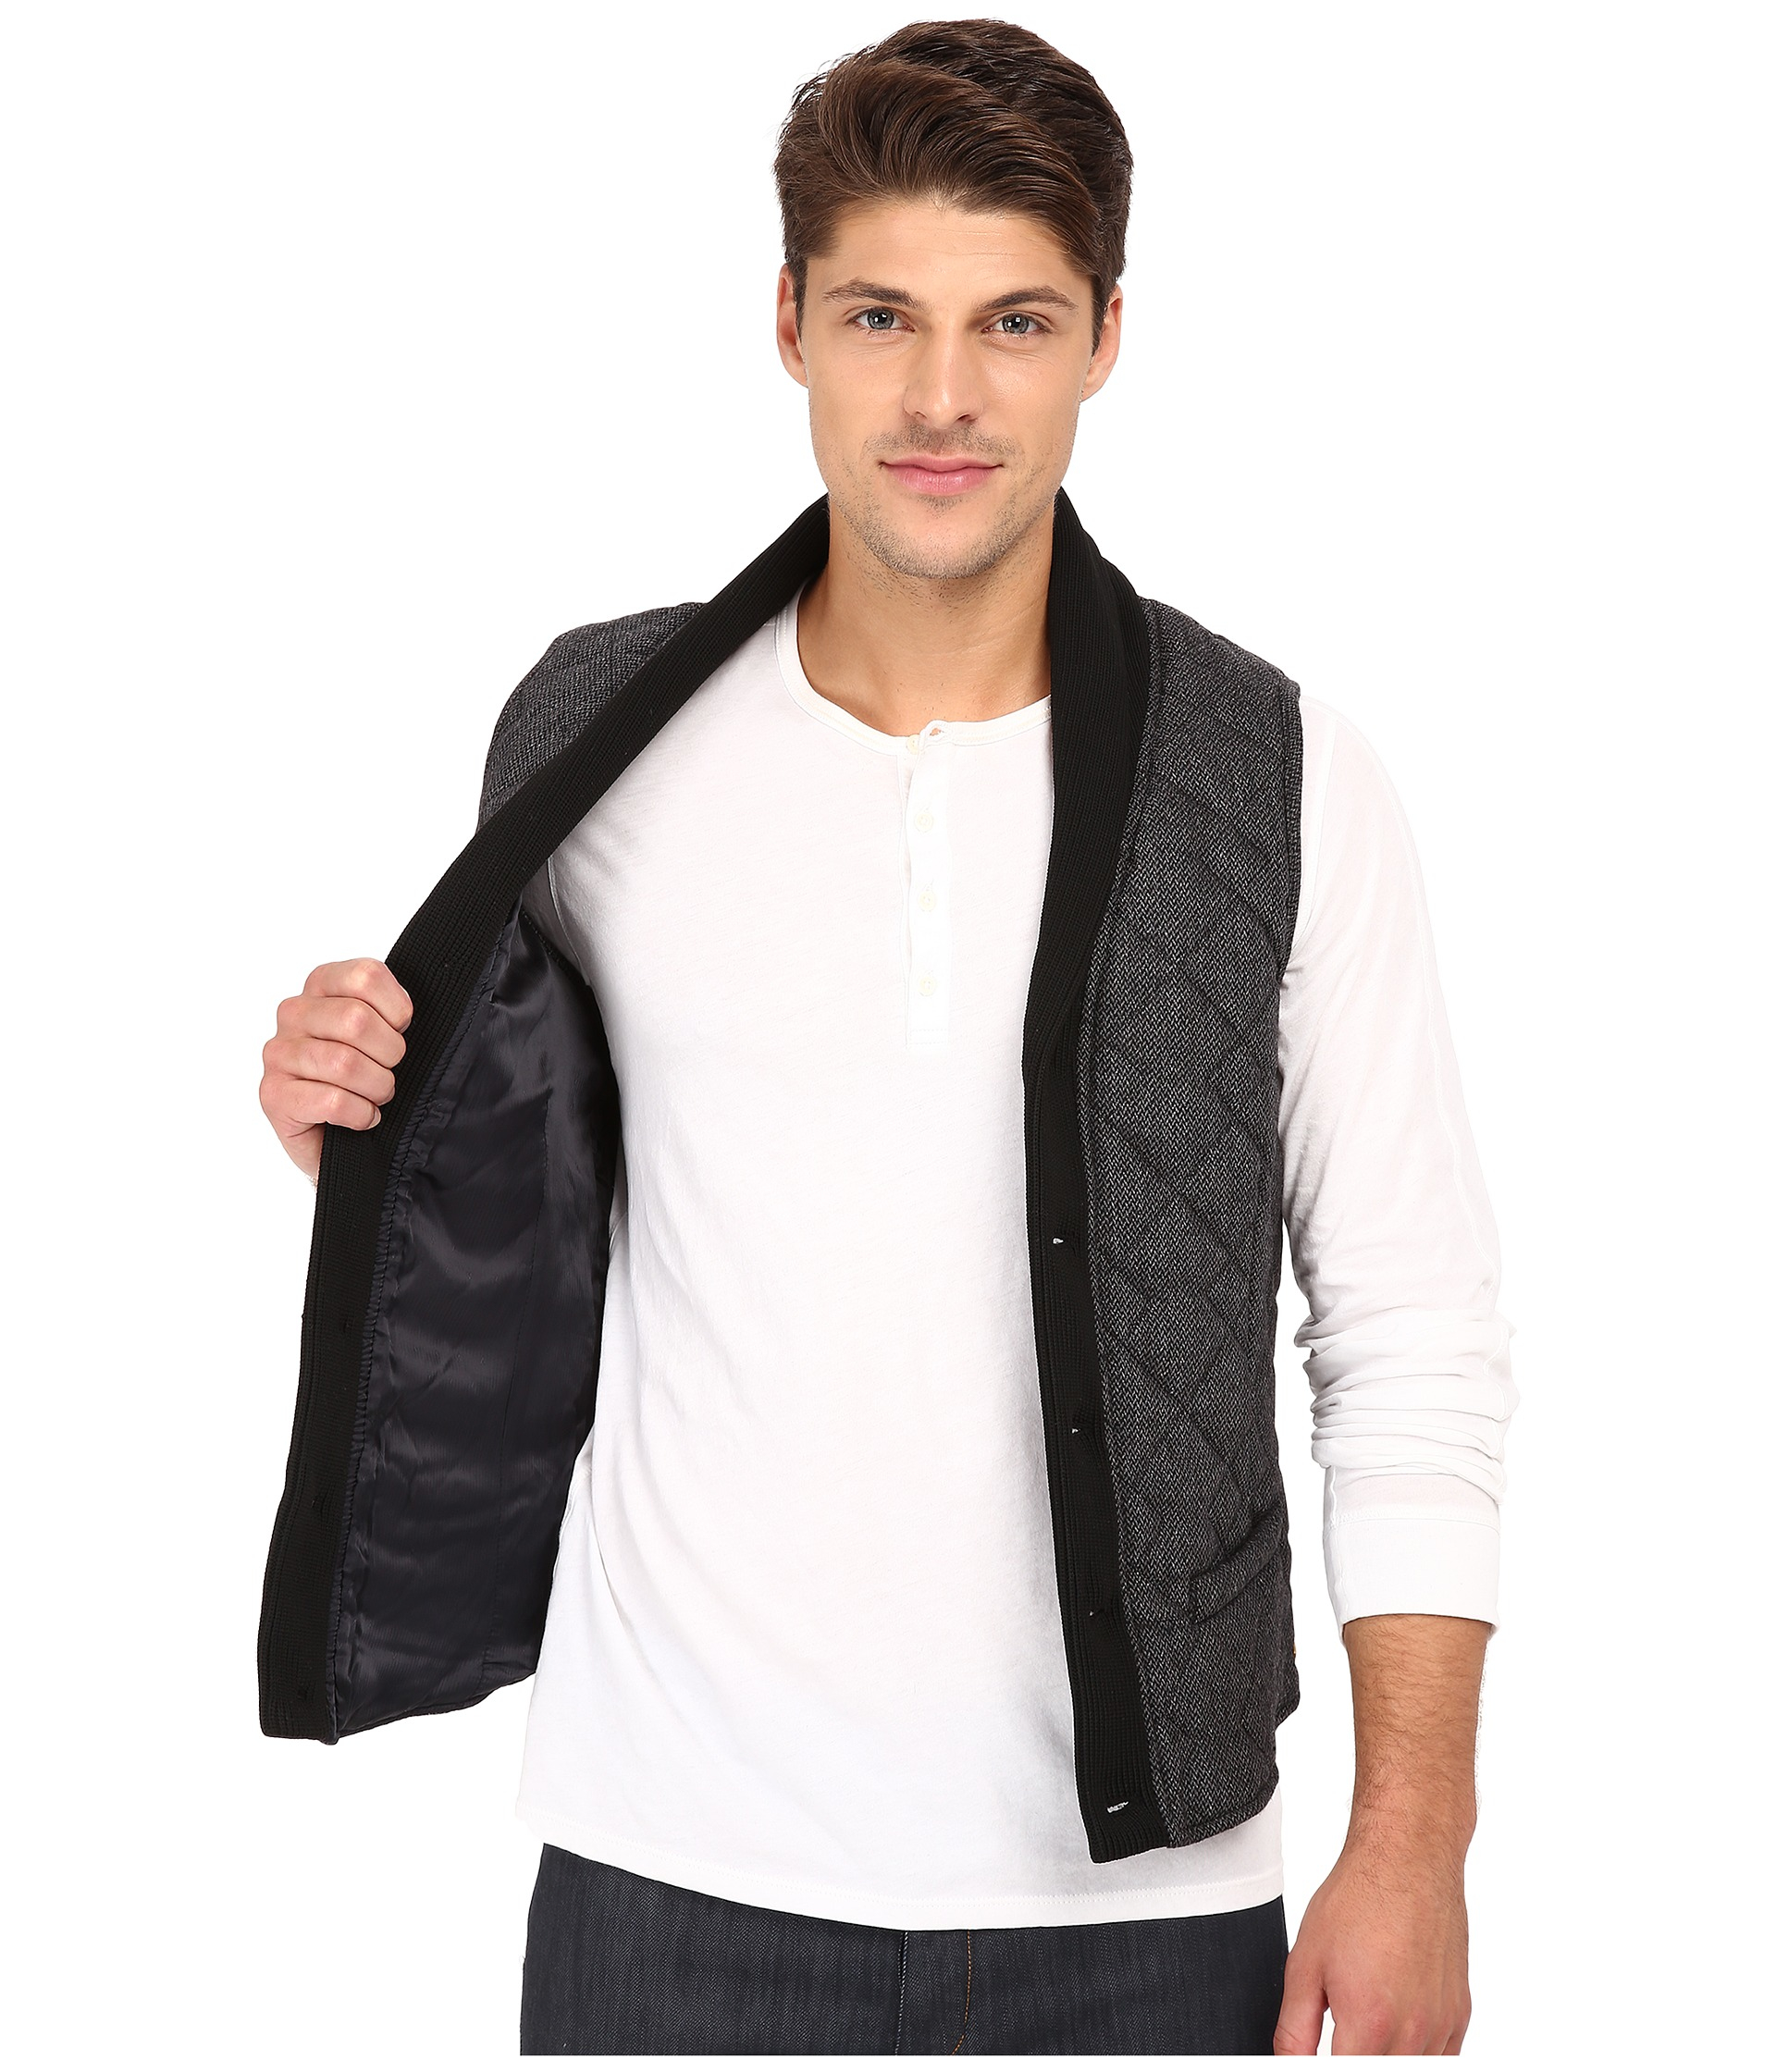 Scotch Amp Soda Wool Shawl Vest In Gray For Men Lyst